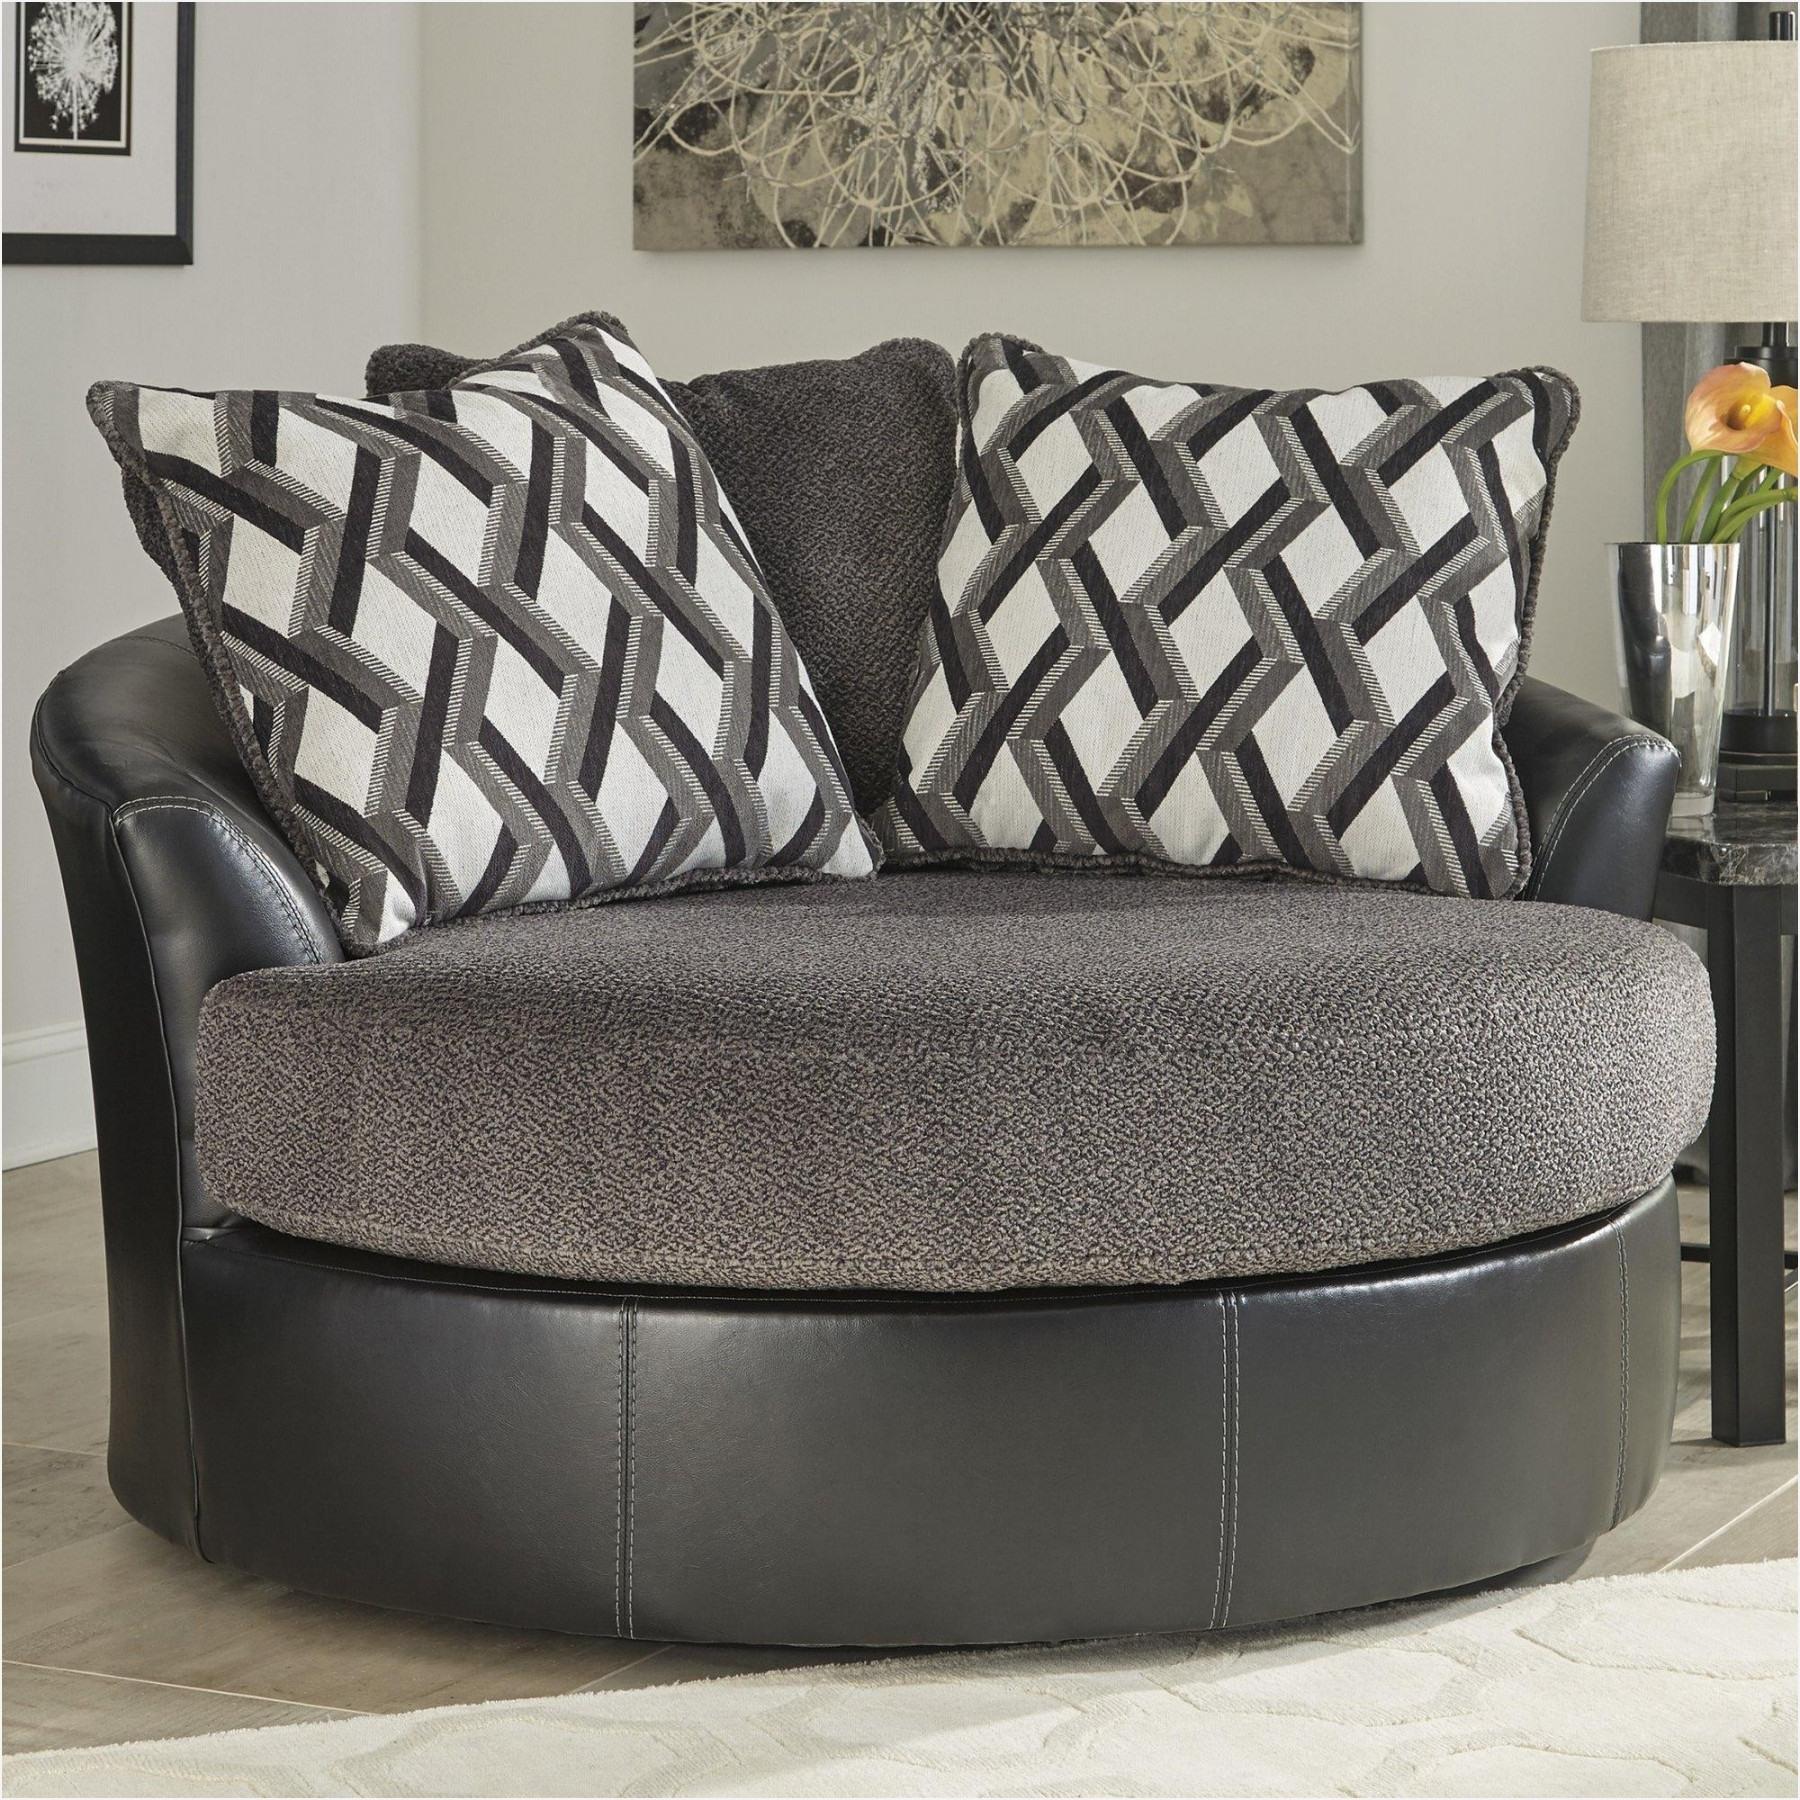 Kohl's Patio Conversation Sets With Regard To Preferred Inspirational Kohls Sofa Covers 17 Inspirational Kohl S Patio Chairs (View 15 of 15)